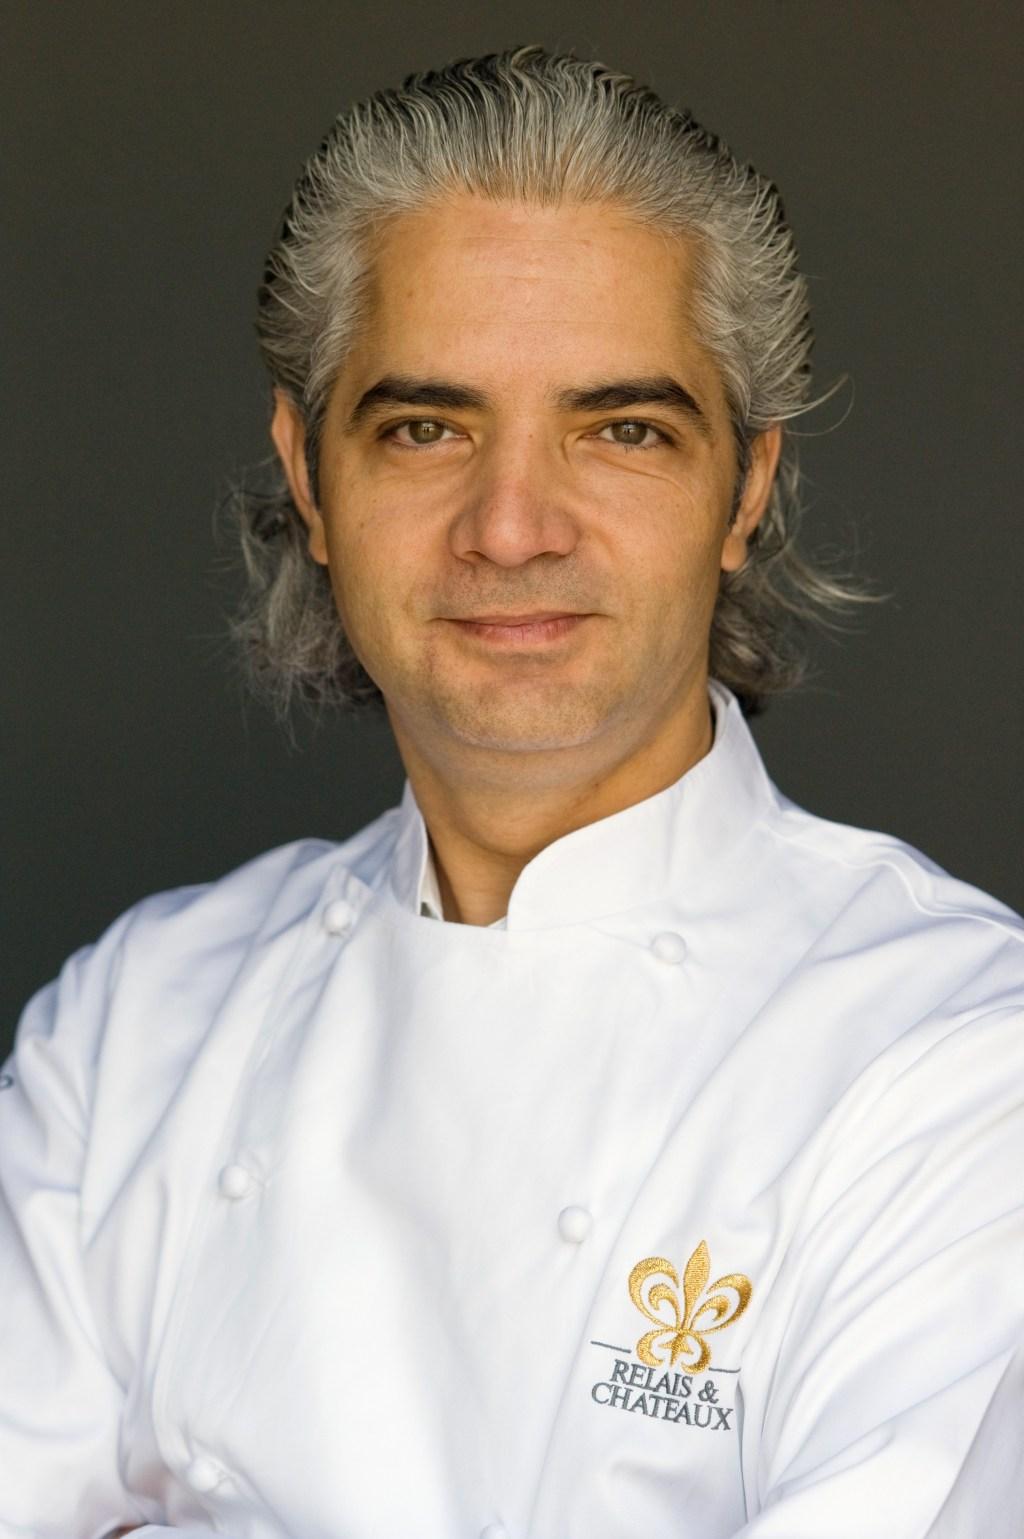 Chef Xavier Mathieu